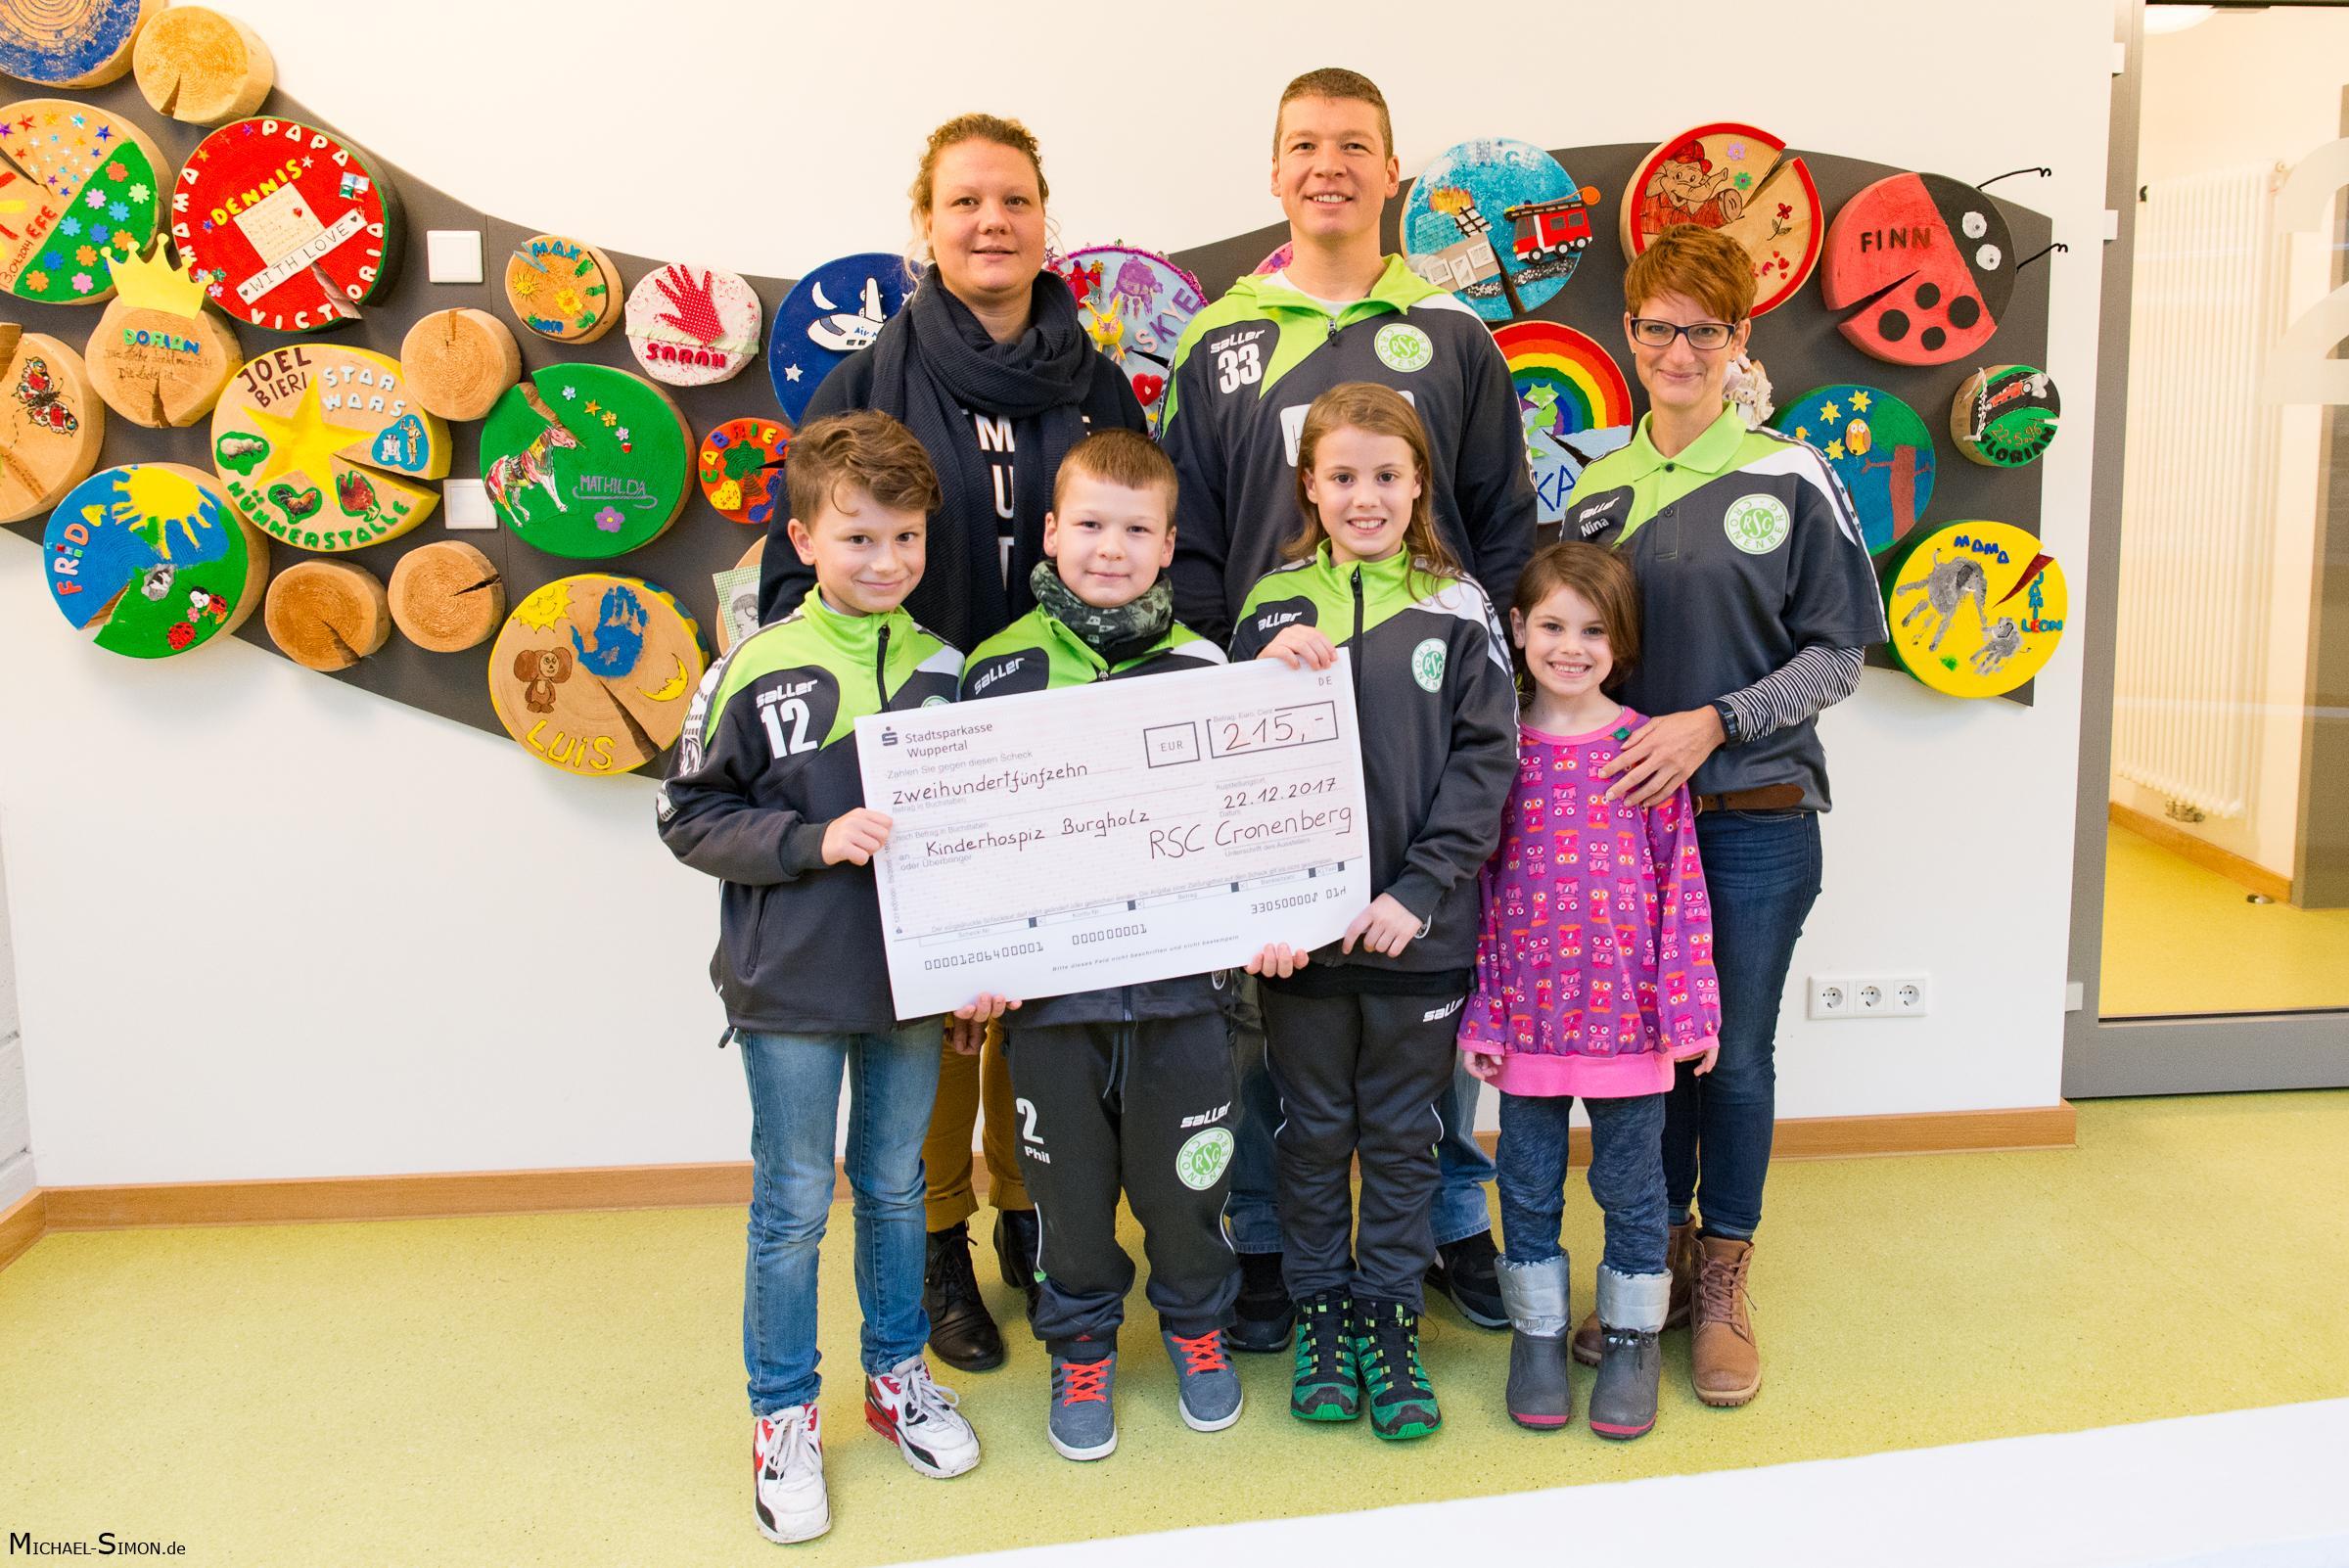 RSC Cronenberg Spendenübergabe Kinderhospiz Burgholz